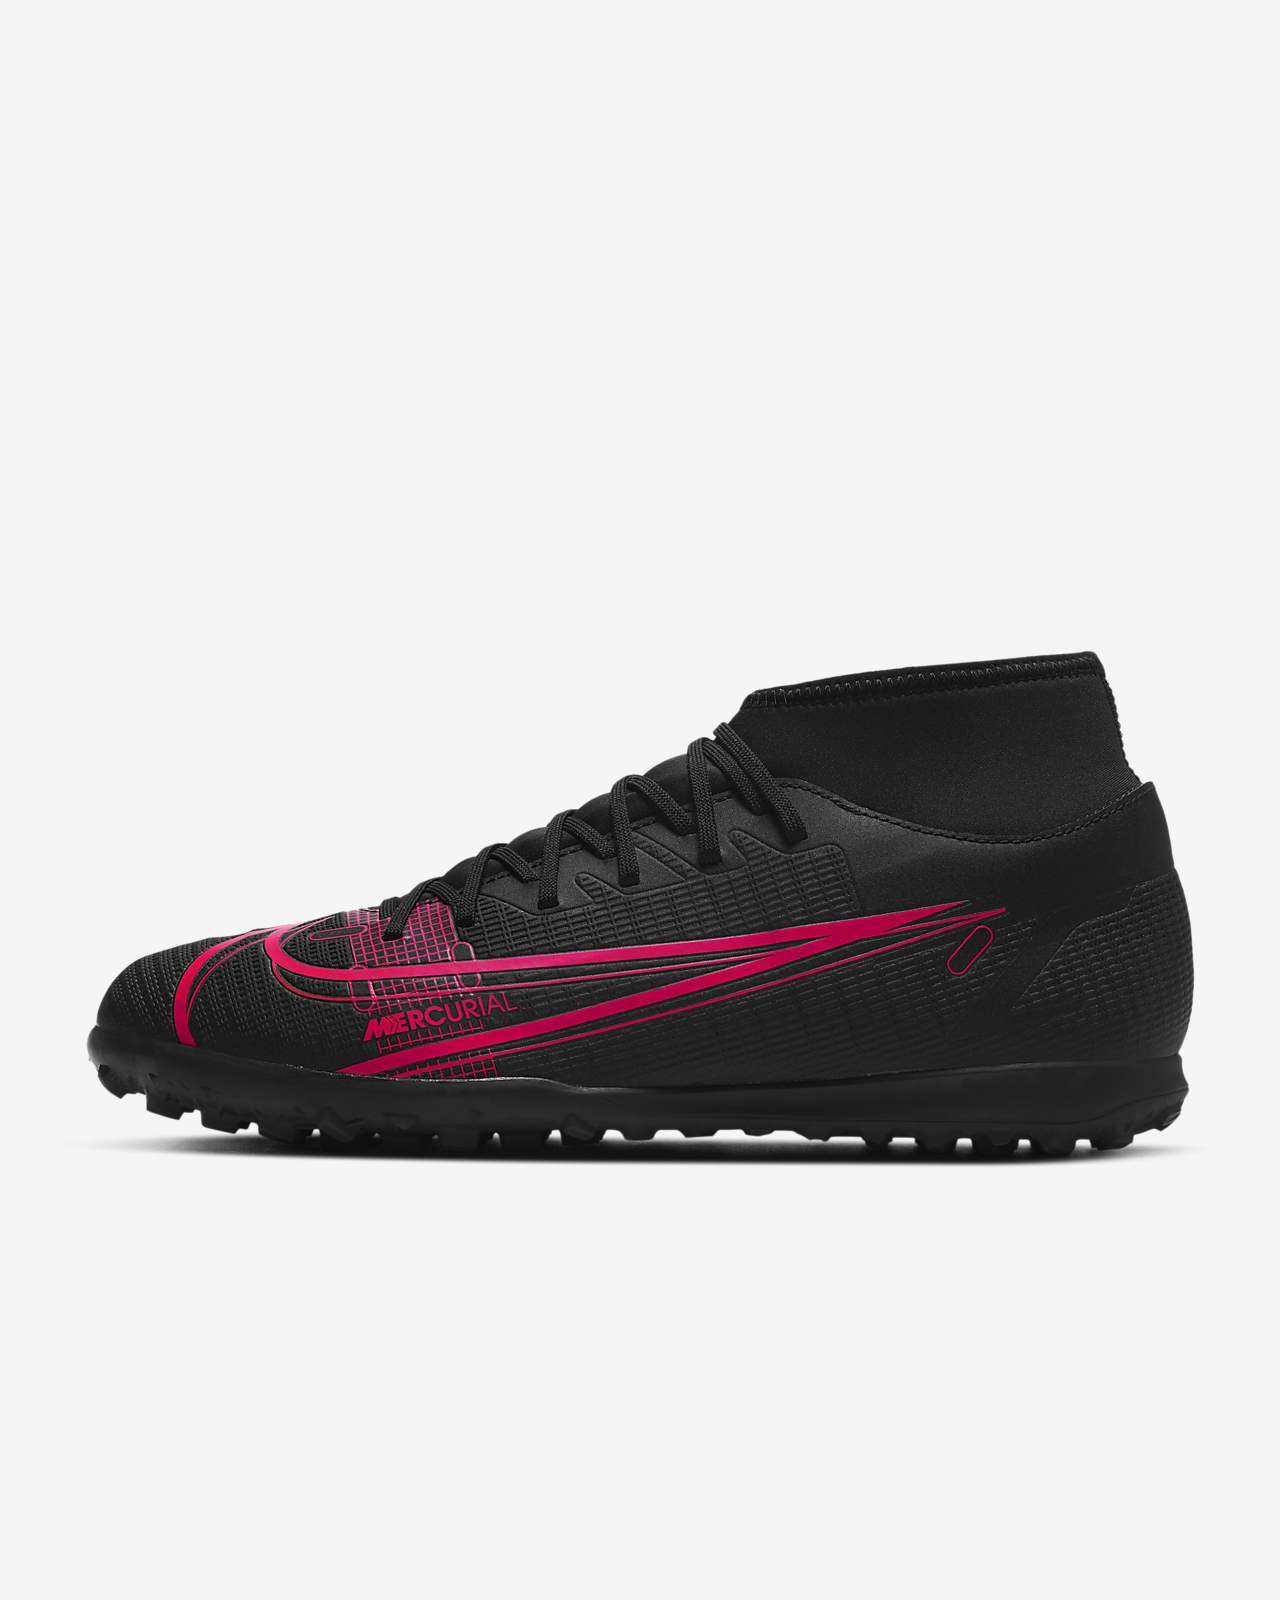 Fotbollssko för grus/turf Nike Mercurial Superfly 8 Club TF